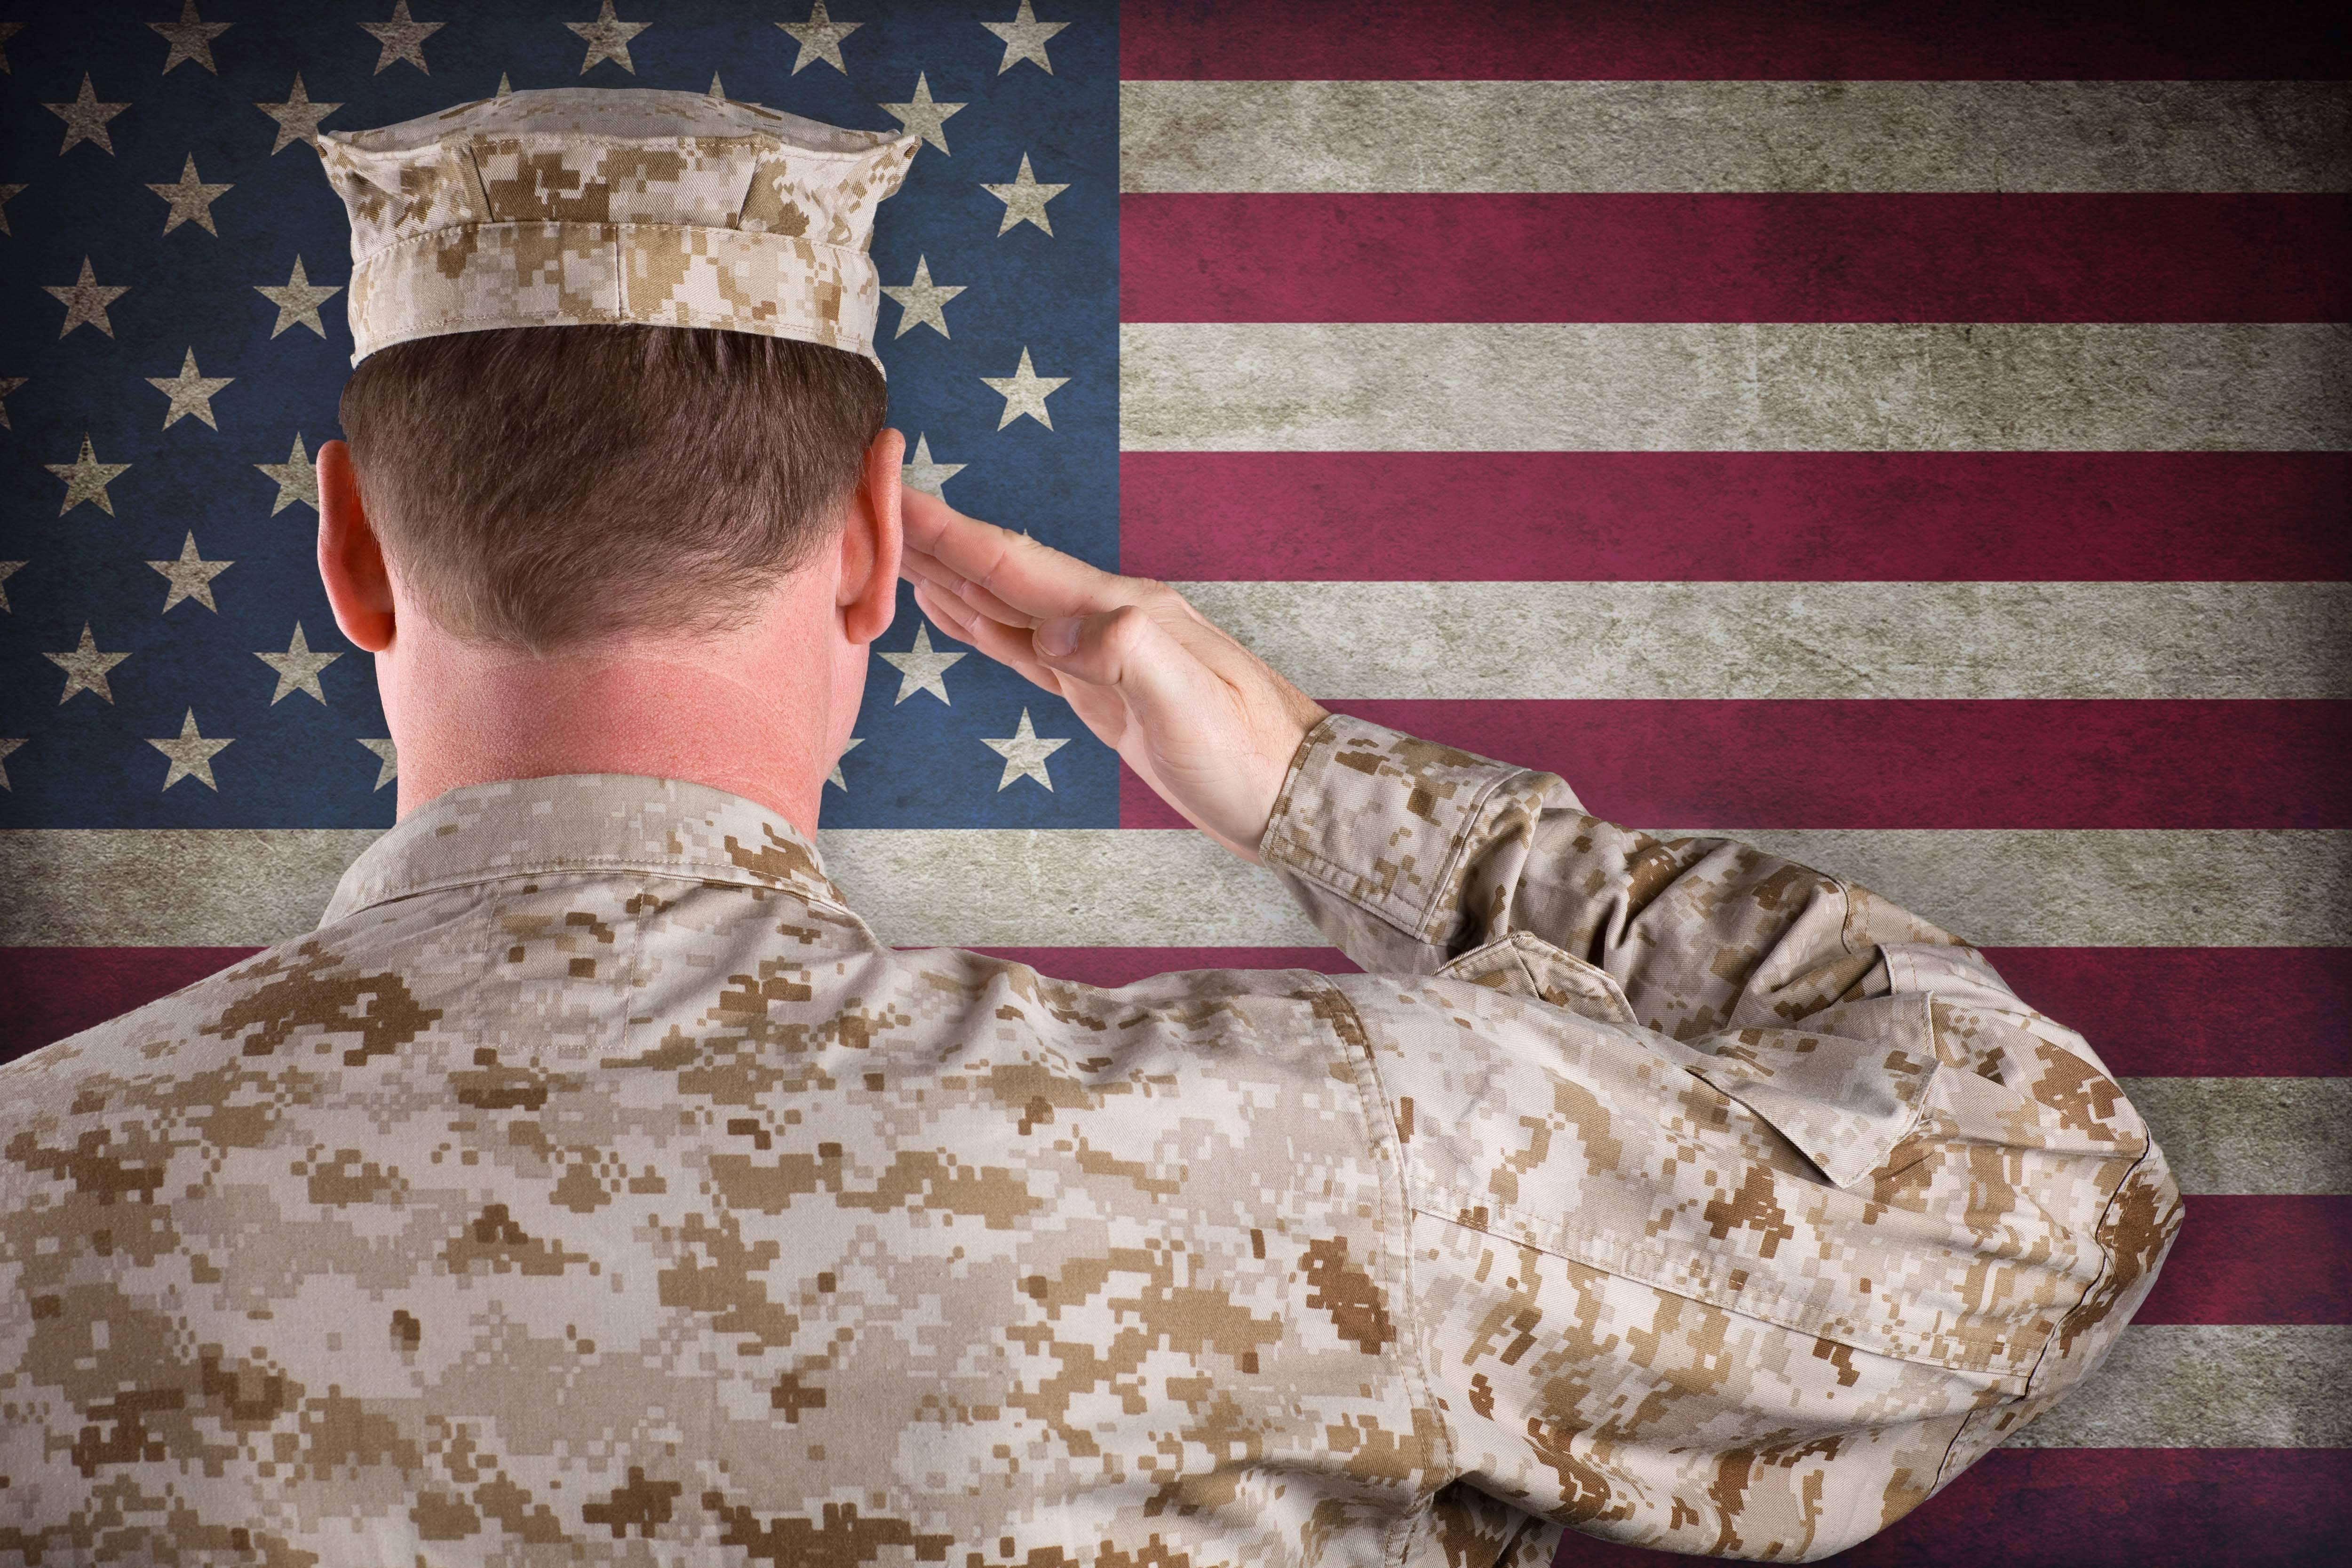 11be00f5c1c19eea1e7f_veteran.jpg